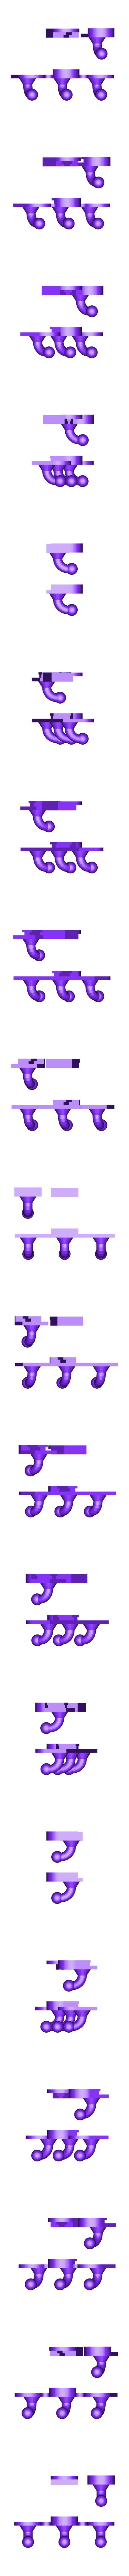 modular wall hanger (3).stl Download free STL file Modular wall hanger • Design to 3D print, jankitokarczew